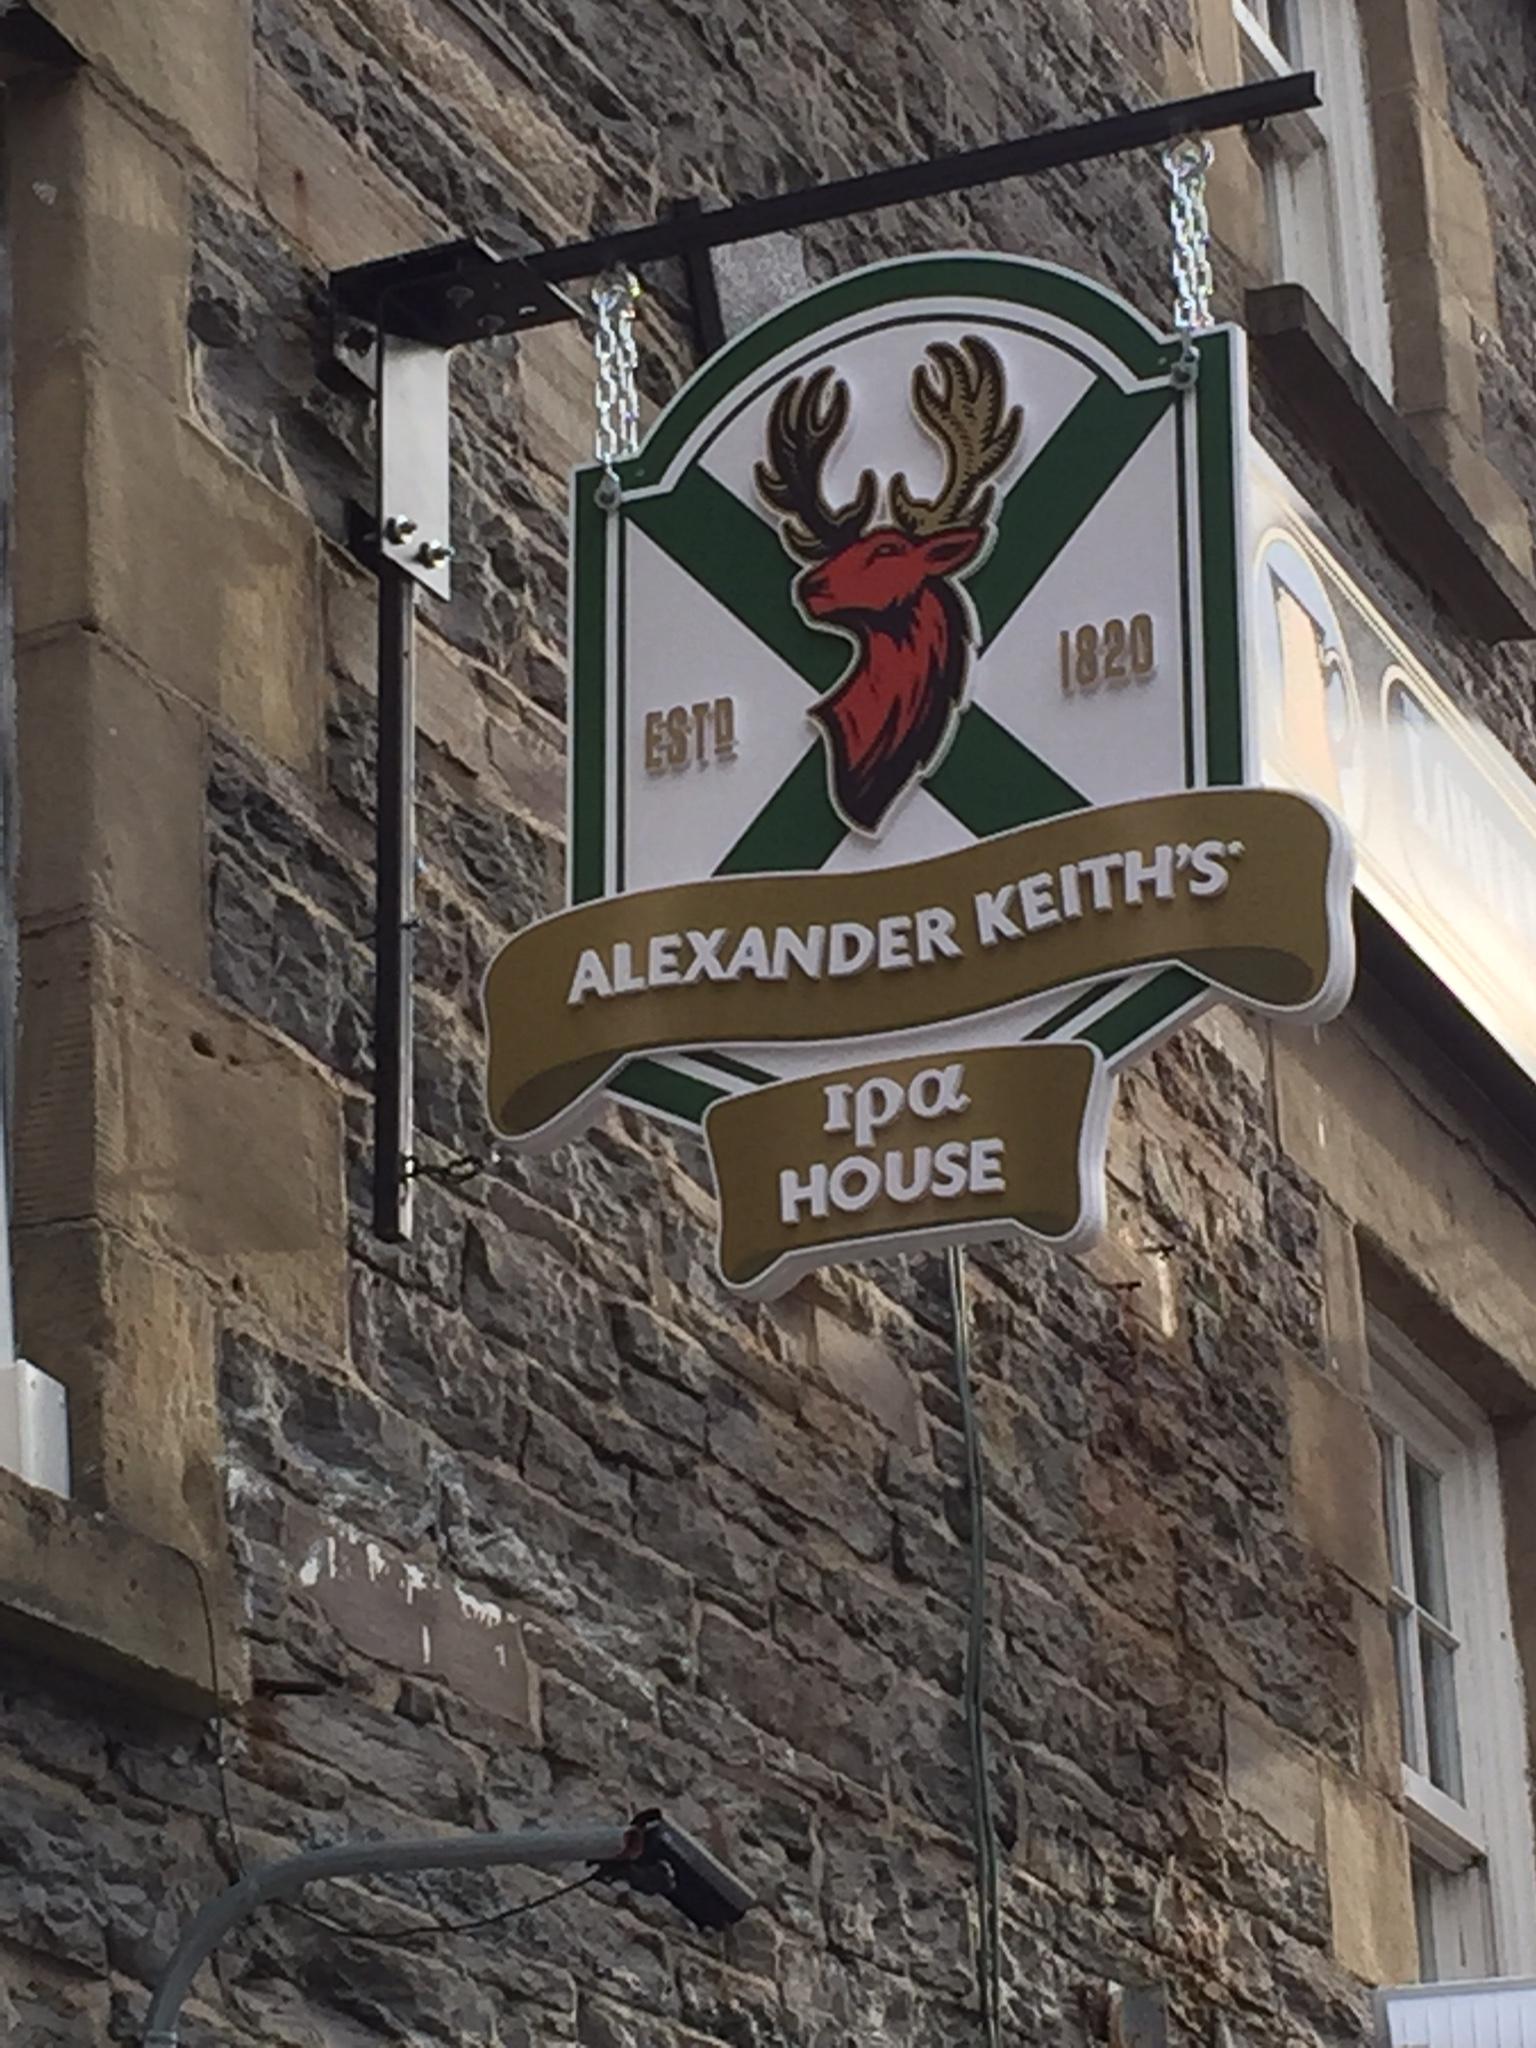 Alexander Keith's IPA House signage